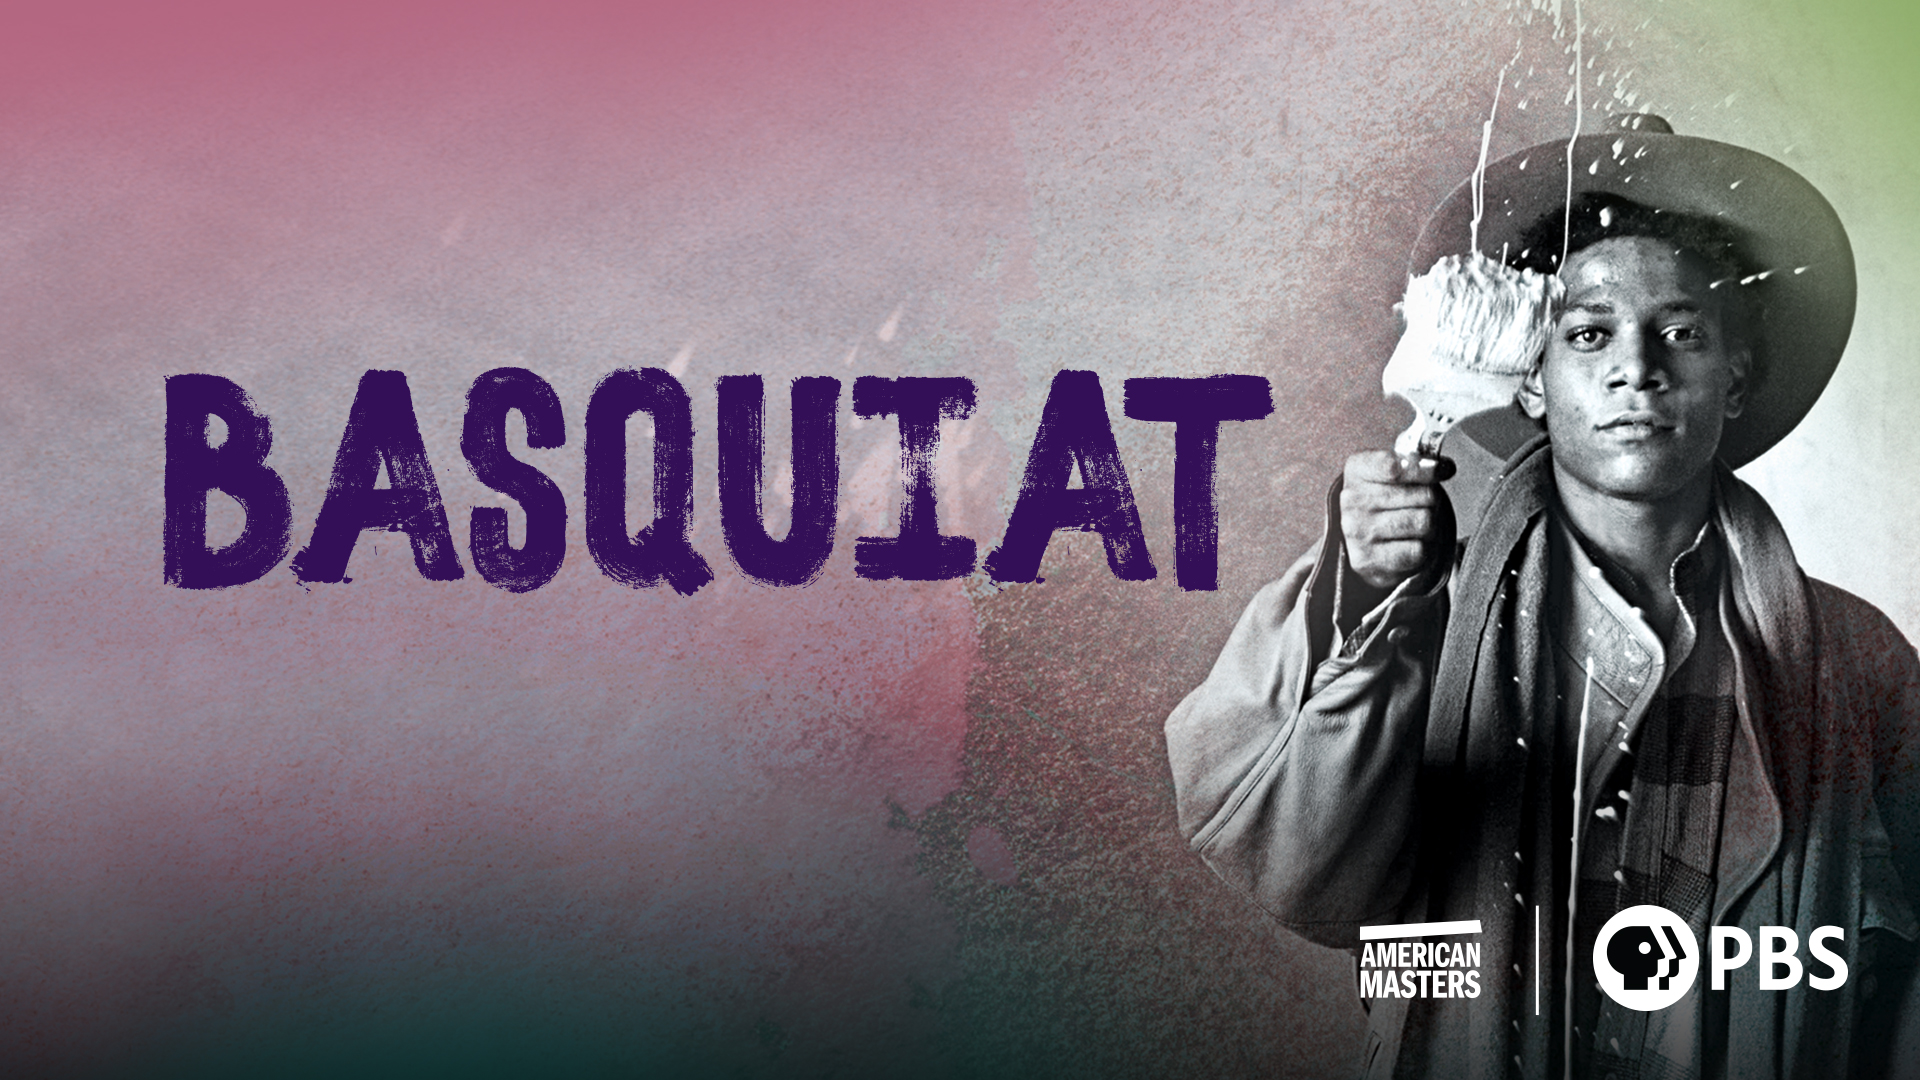 American Masters: Basquiat